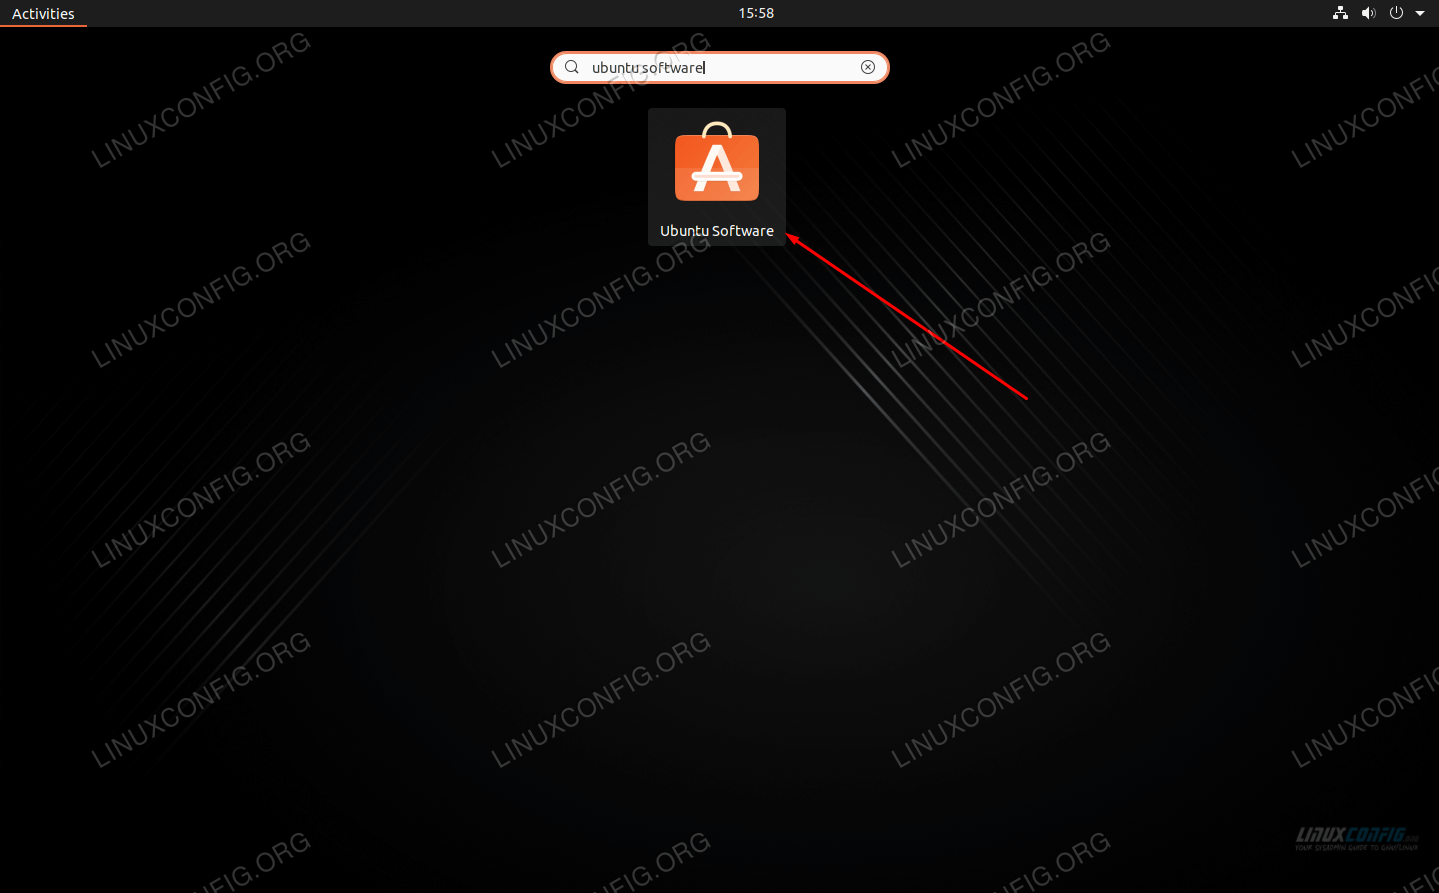 Locate the Ubuntu Software utility